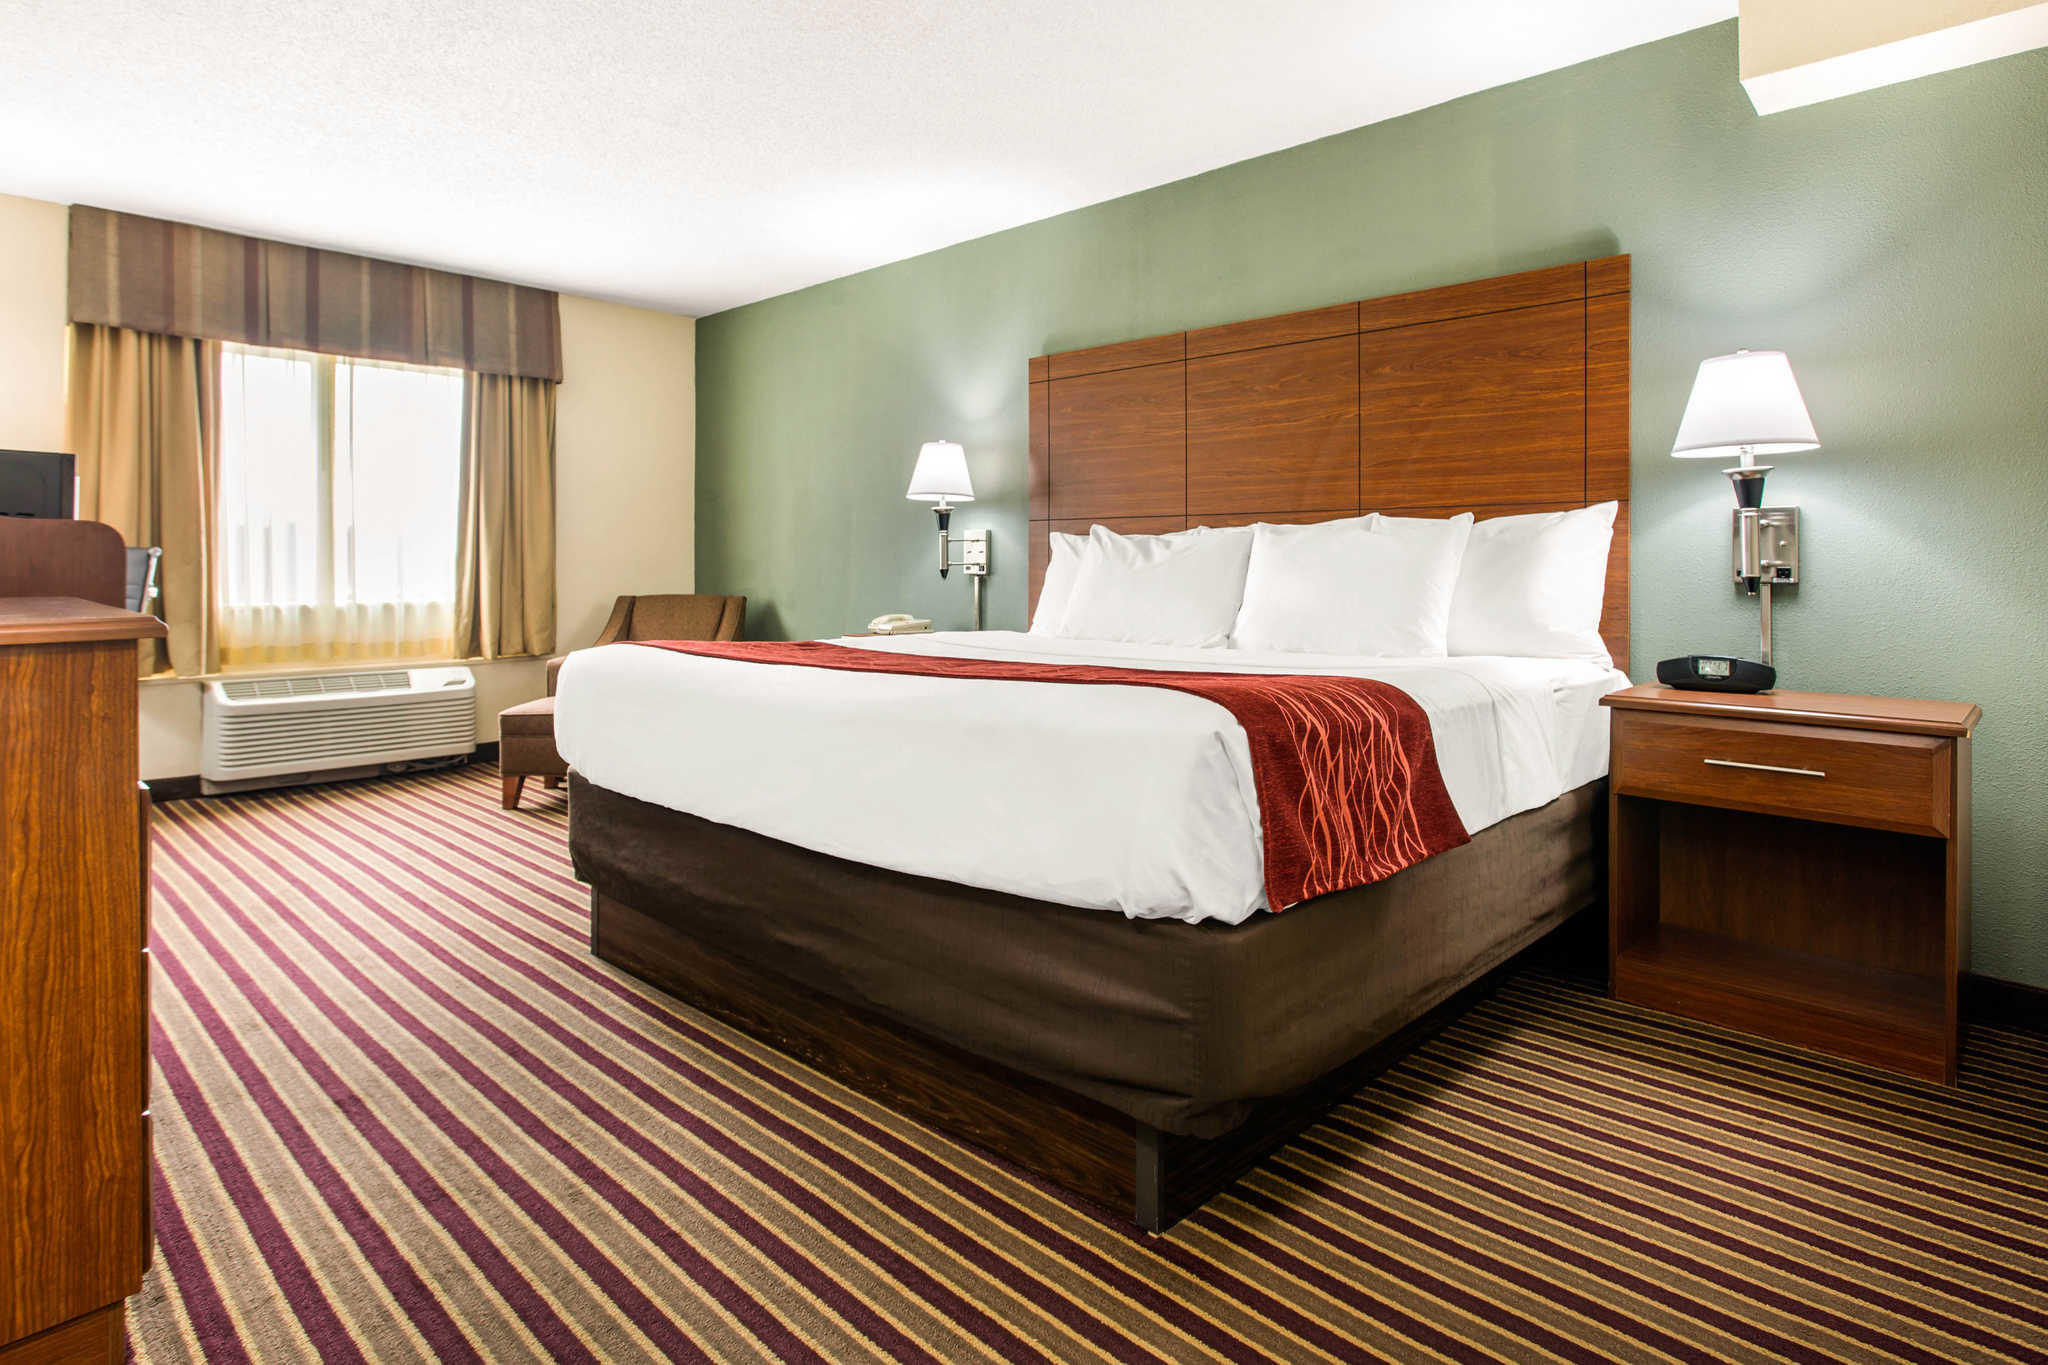 Comfort Inn & Suites Crabtree Valley image 8